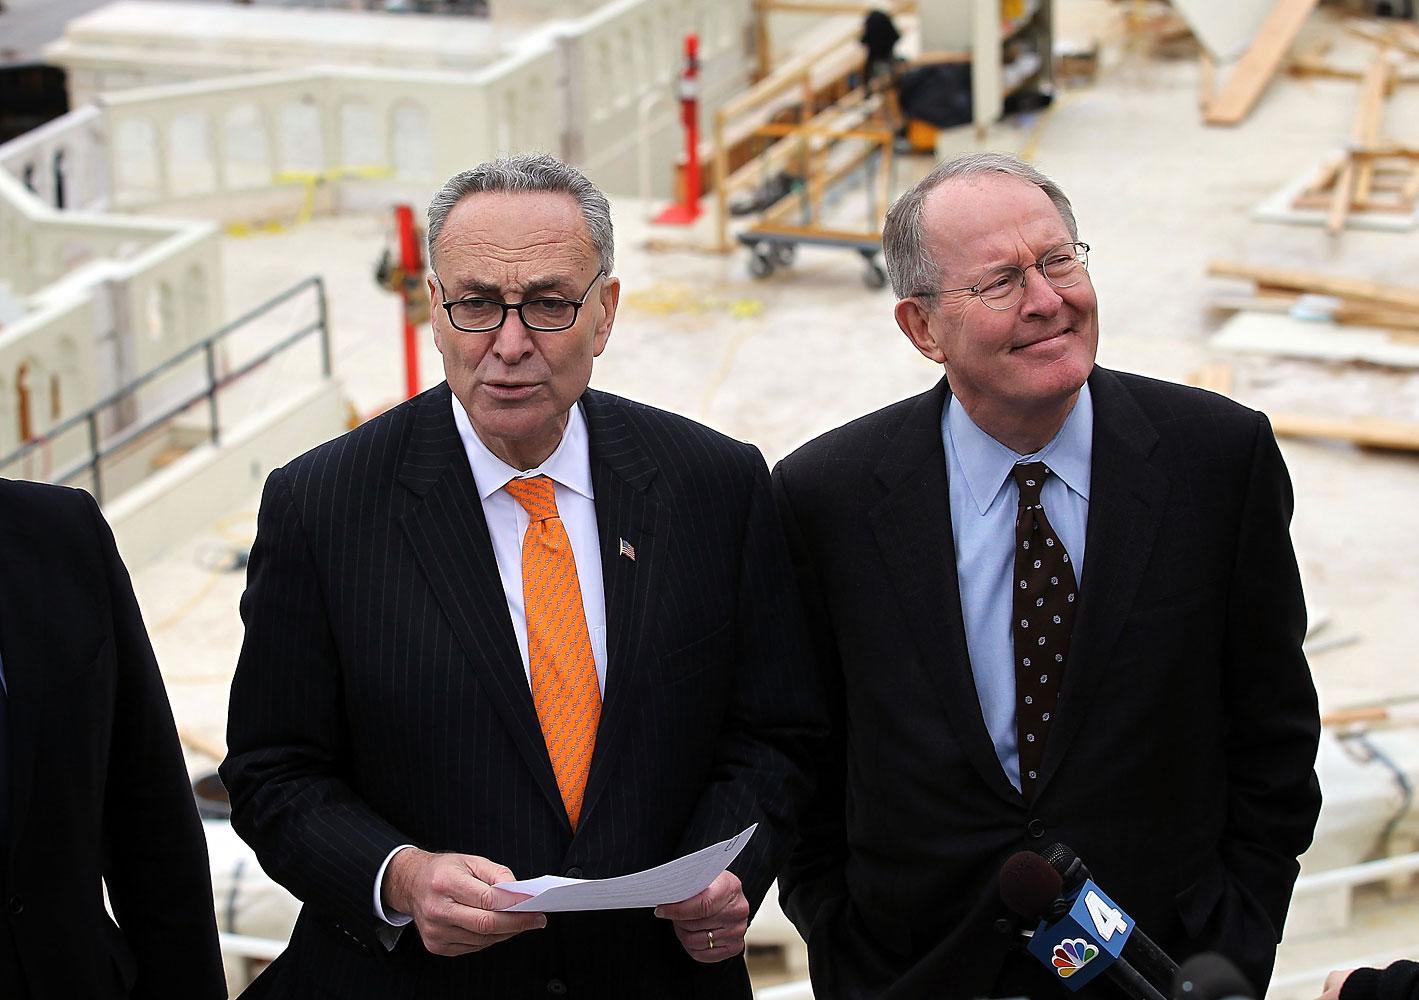 U.S. Senators Charles Schumer (D-NY) (L) and Lamar Alexander (R-TN) (R),  on Capitol Hill in Washington, DC in 2012.